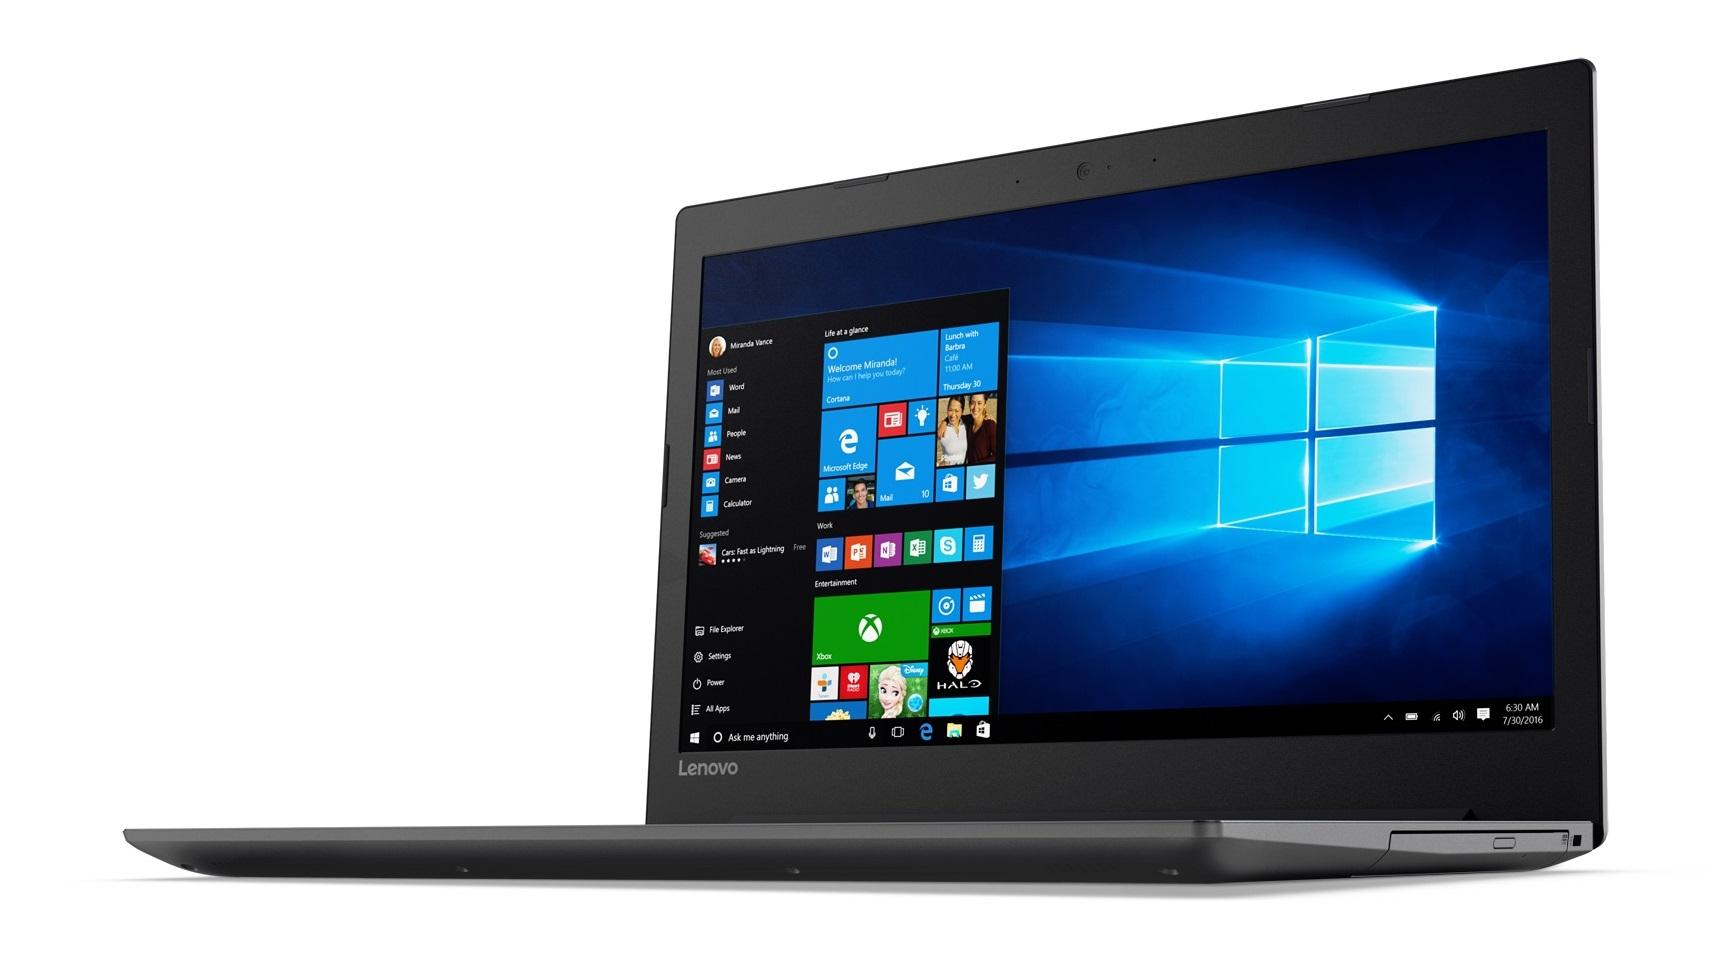 Фото  Ноутбук Lenovo ideapad 320-15IKB Onyx Black (80XL041VRA)